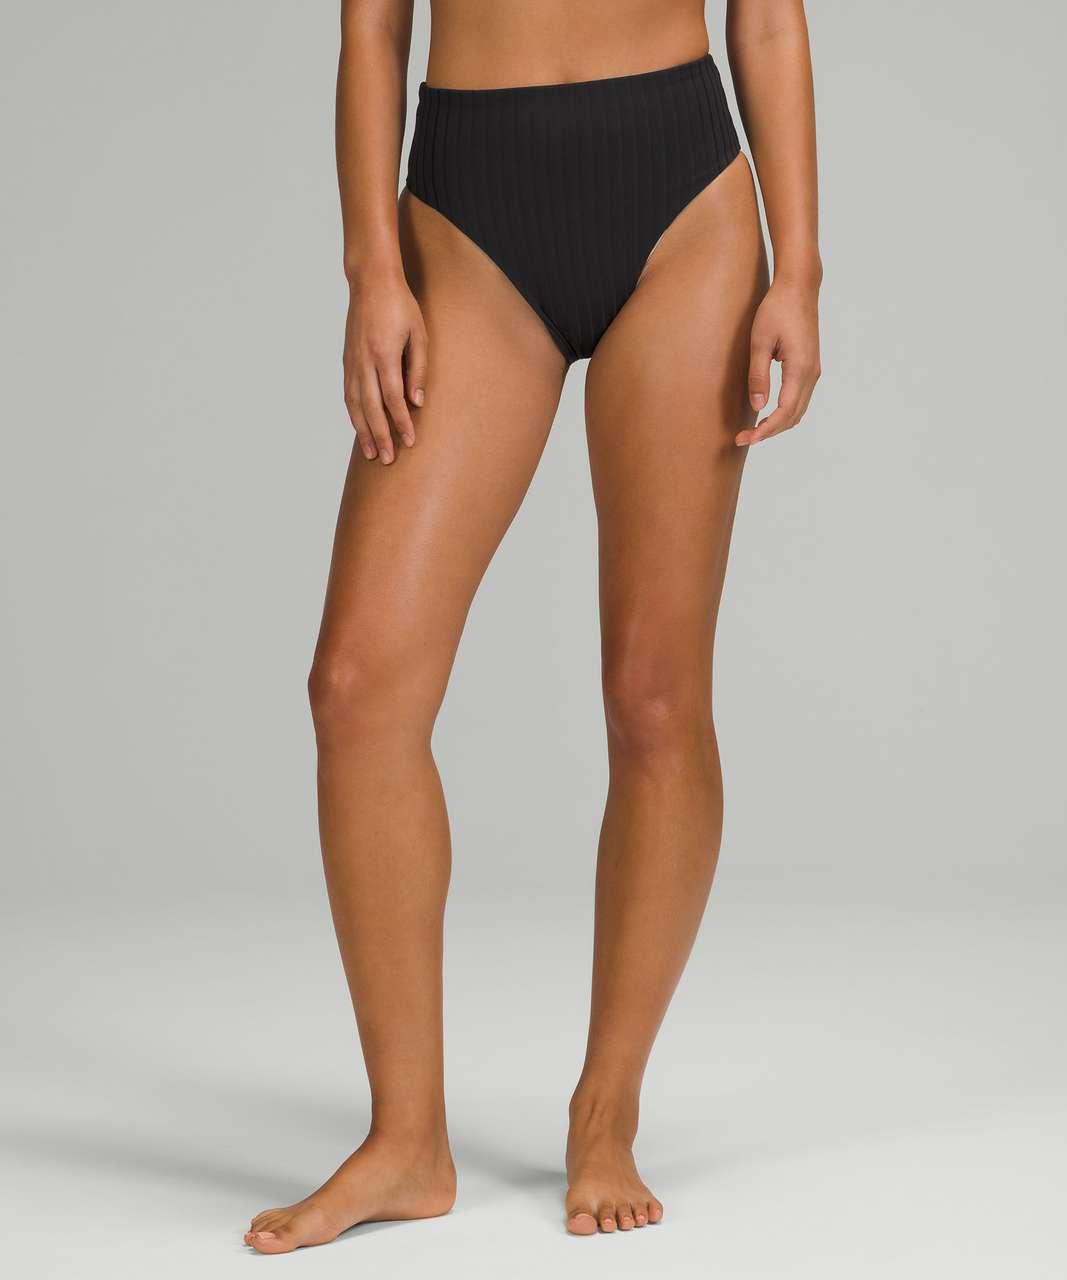 Lululemon Ribbed High-Waist Extra-Skimpy Swim Bottom - Black